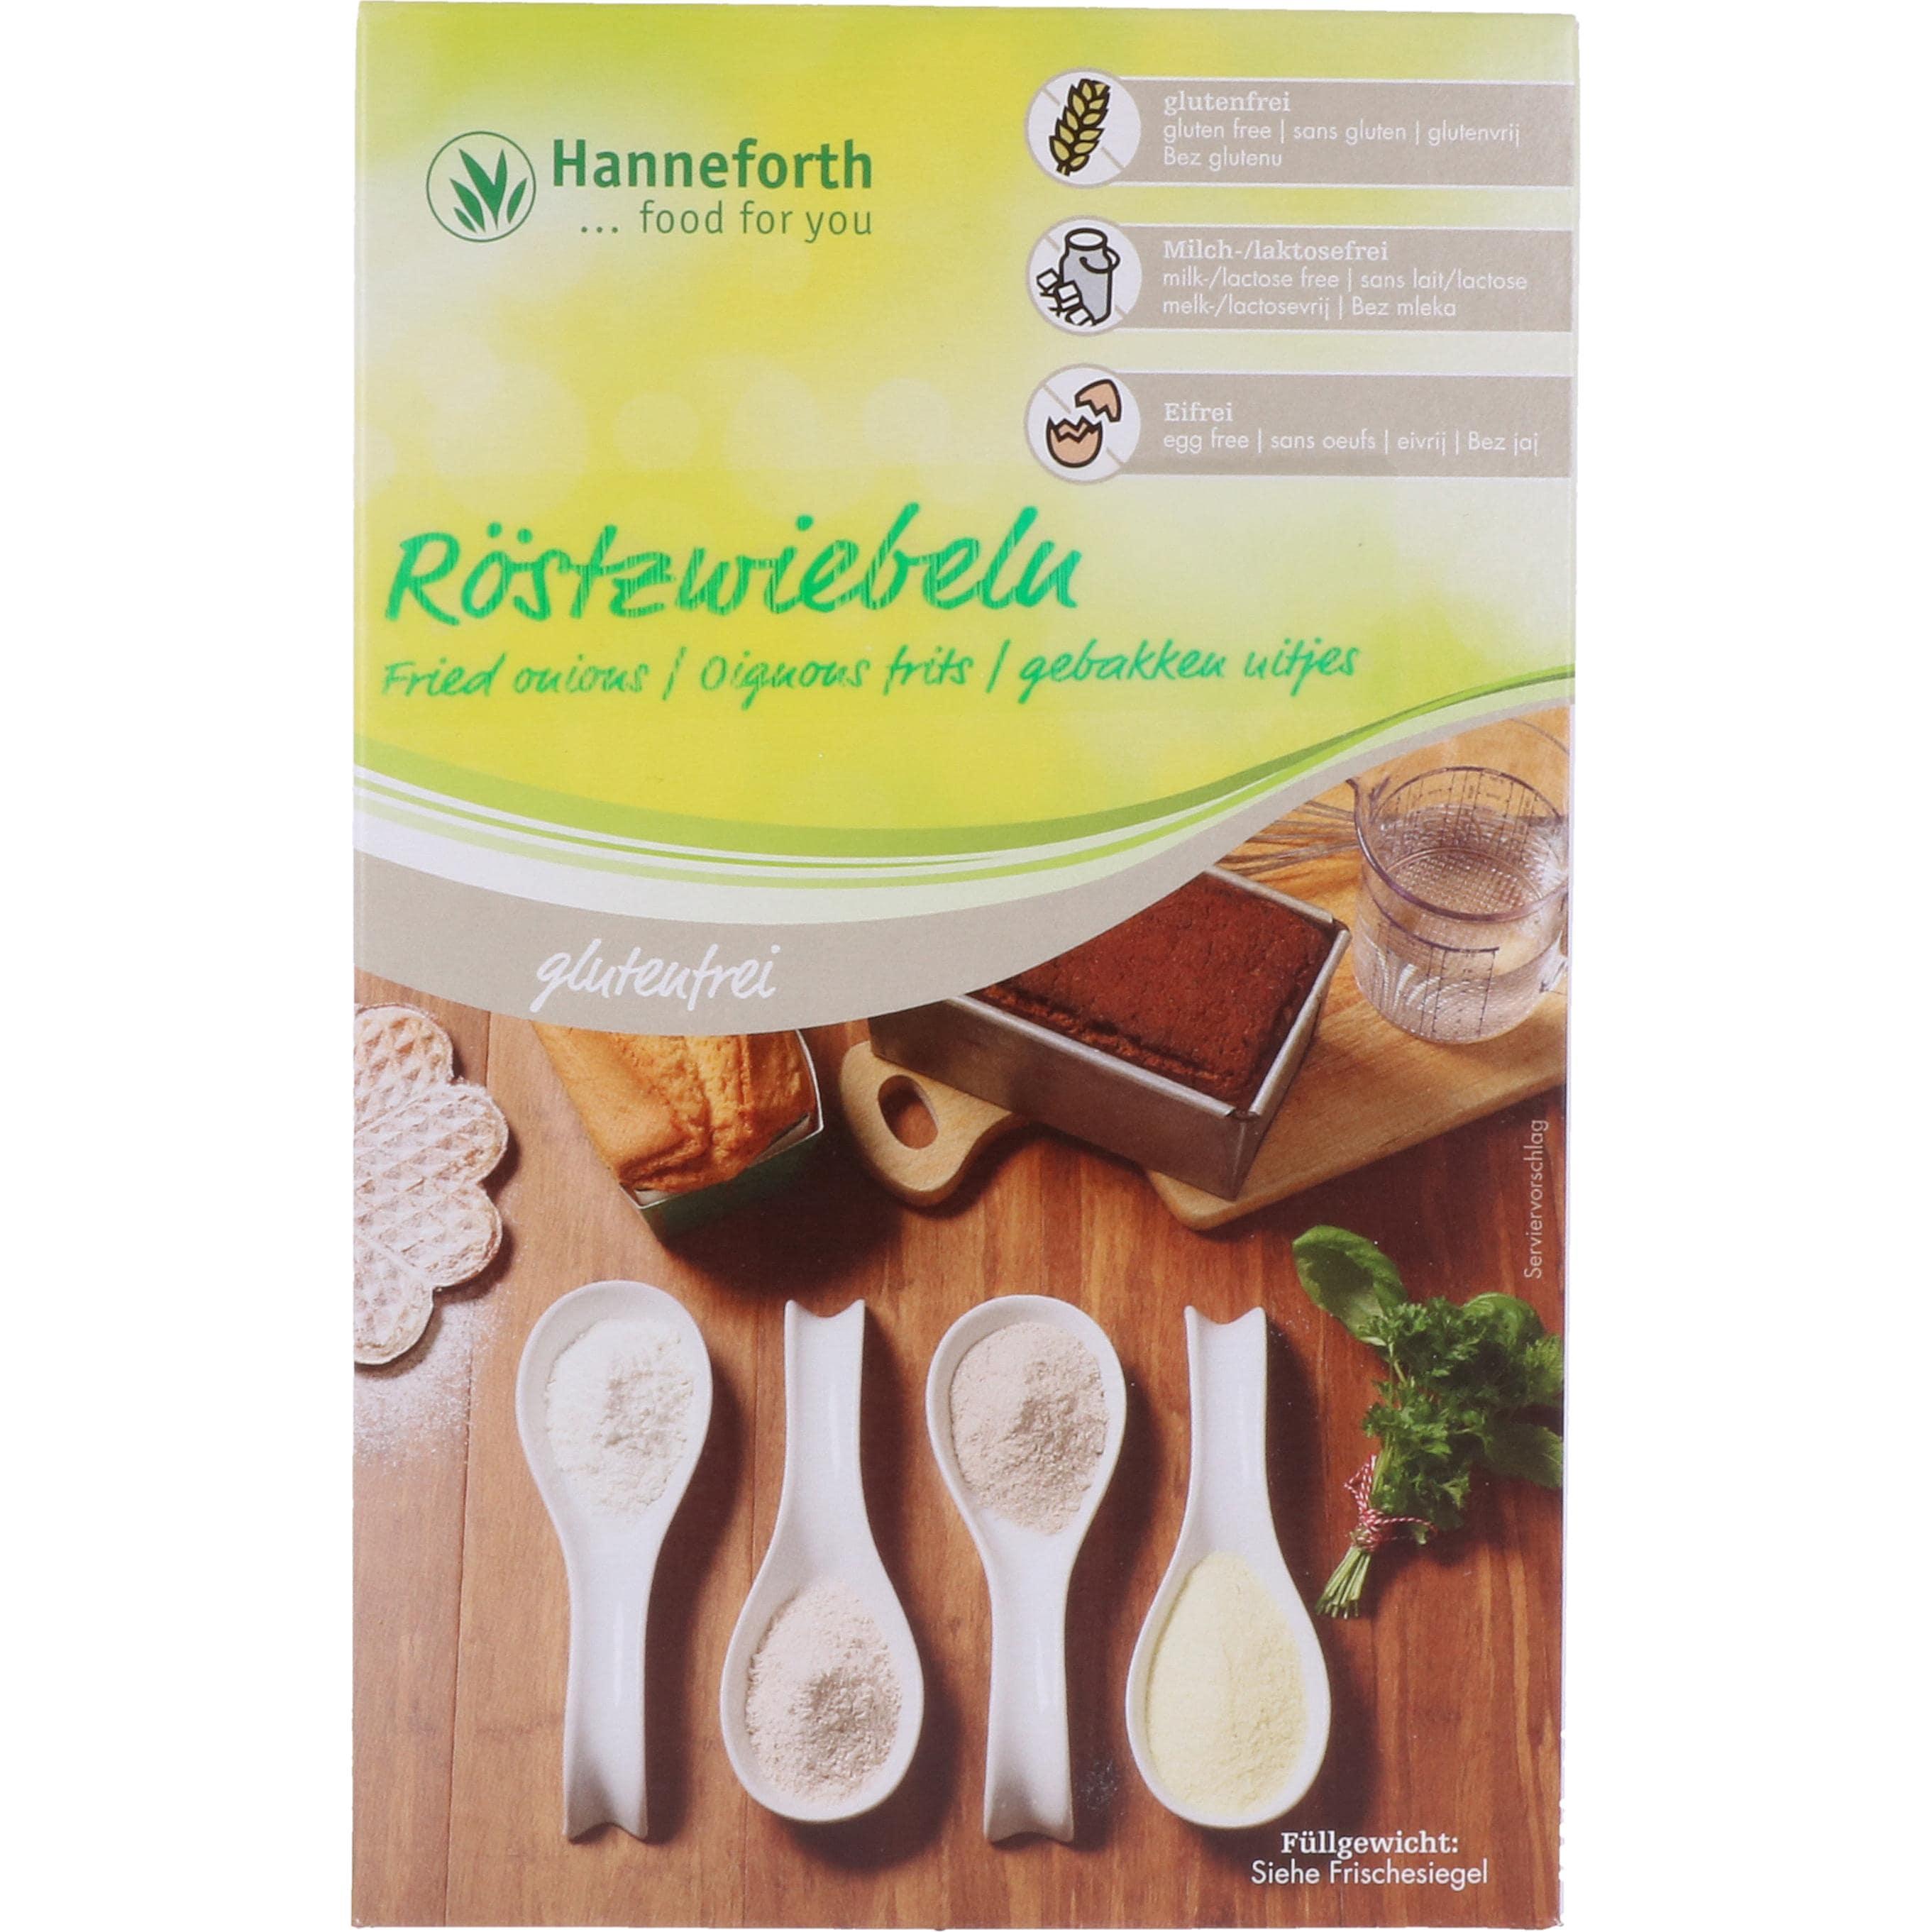 Hanneforth, food for you Röstzwiebeln 250g